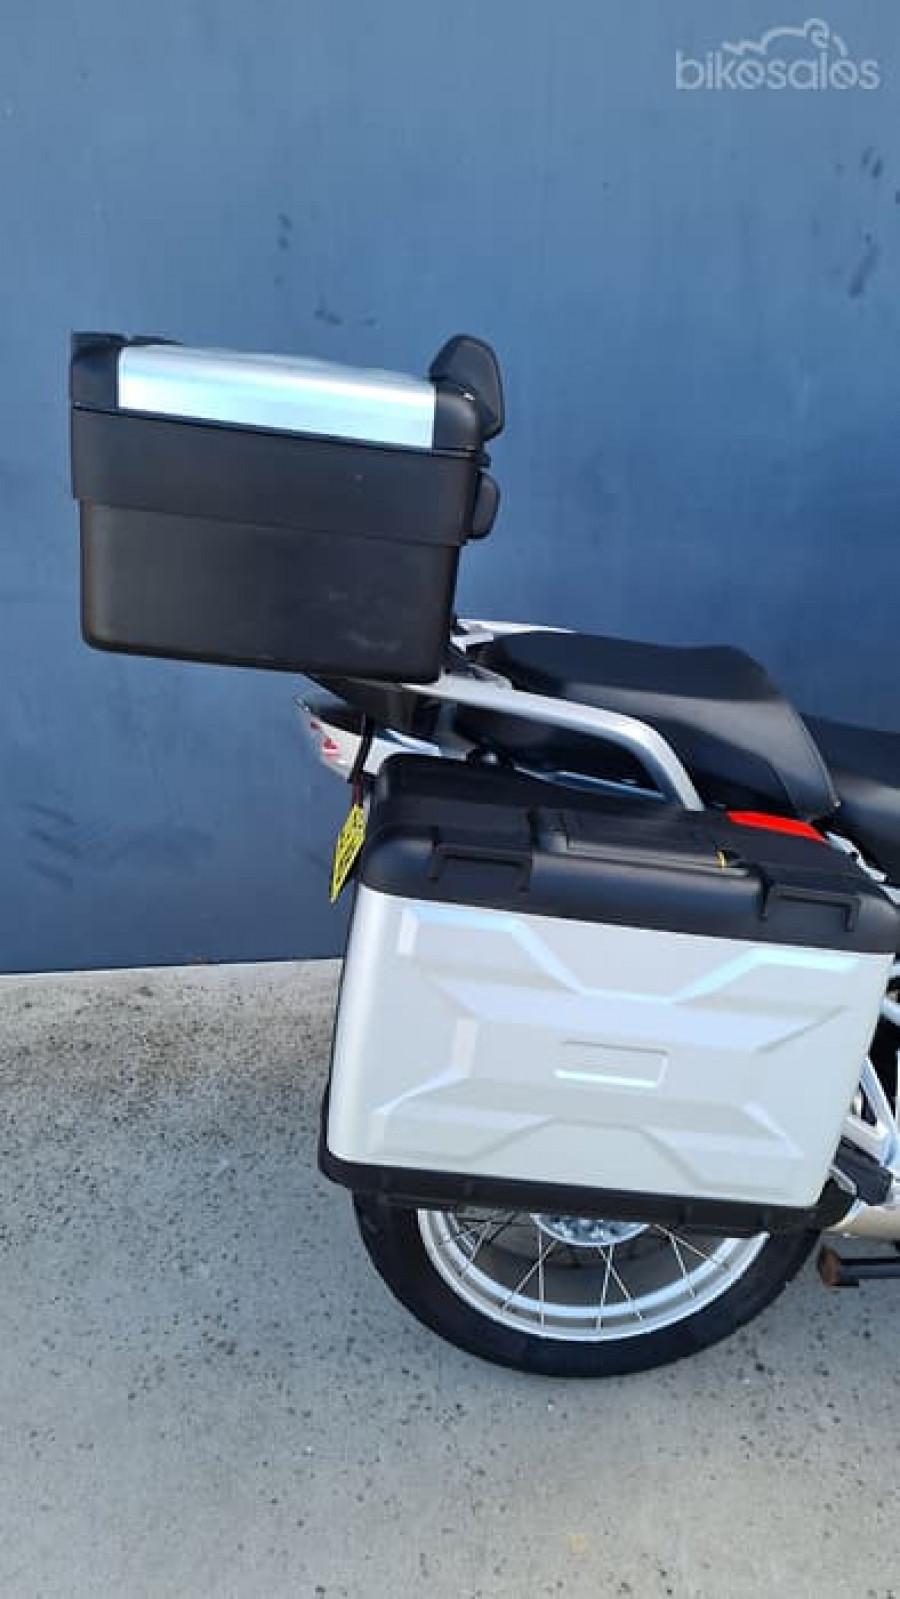 2014 BMW R 1200 GS  R Dual Purpose Motorcycle Image 17